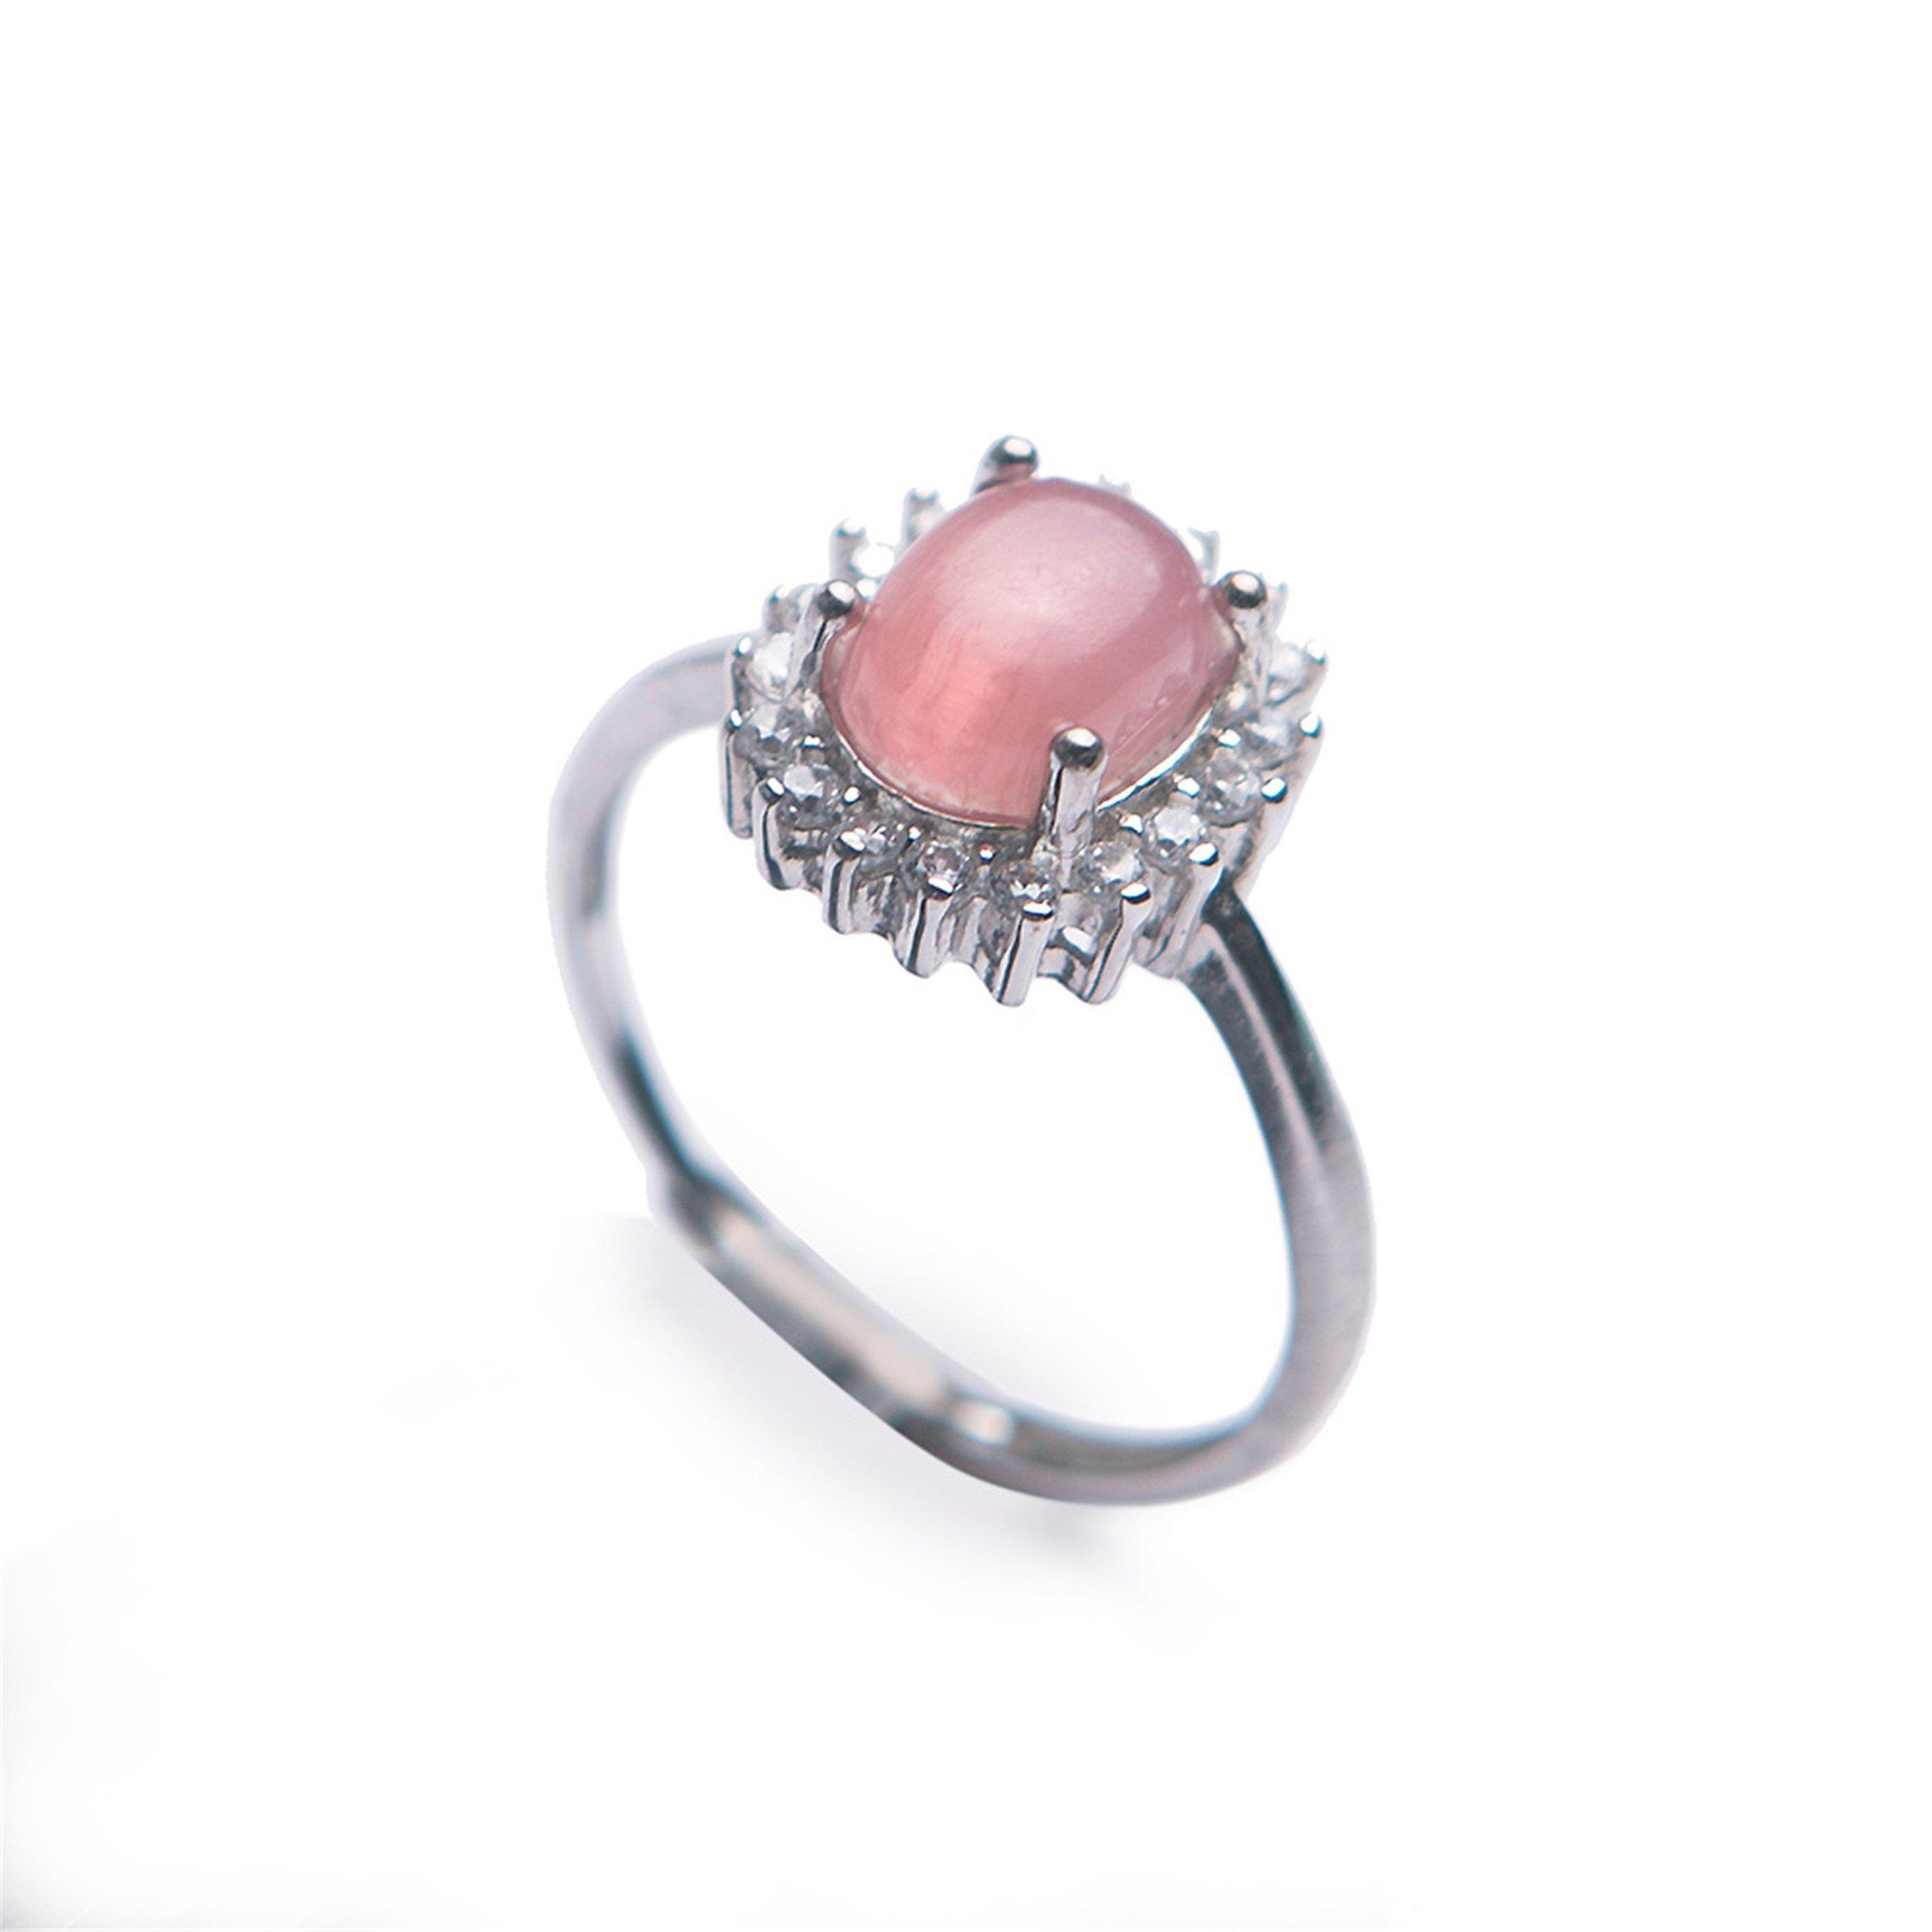 LiZiFang Natural Red Rhodochrosite Gemstone Crystal Fashion Silver Wedding Rings Adjustable Size